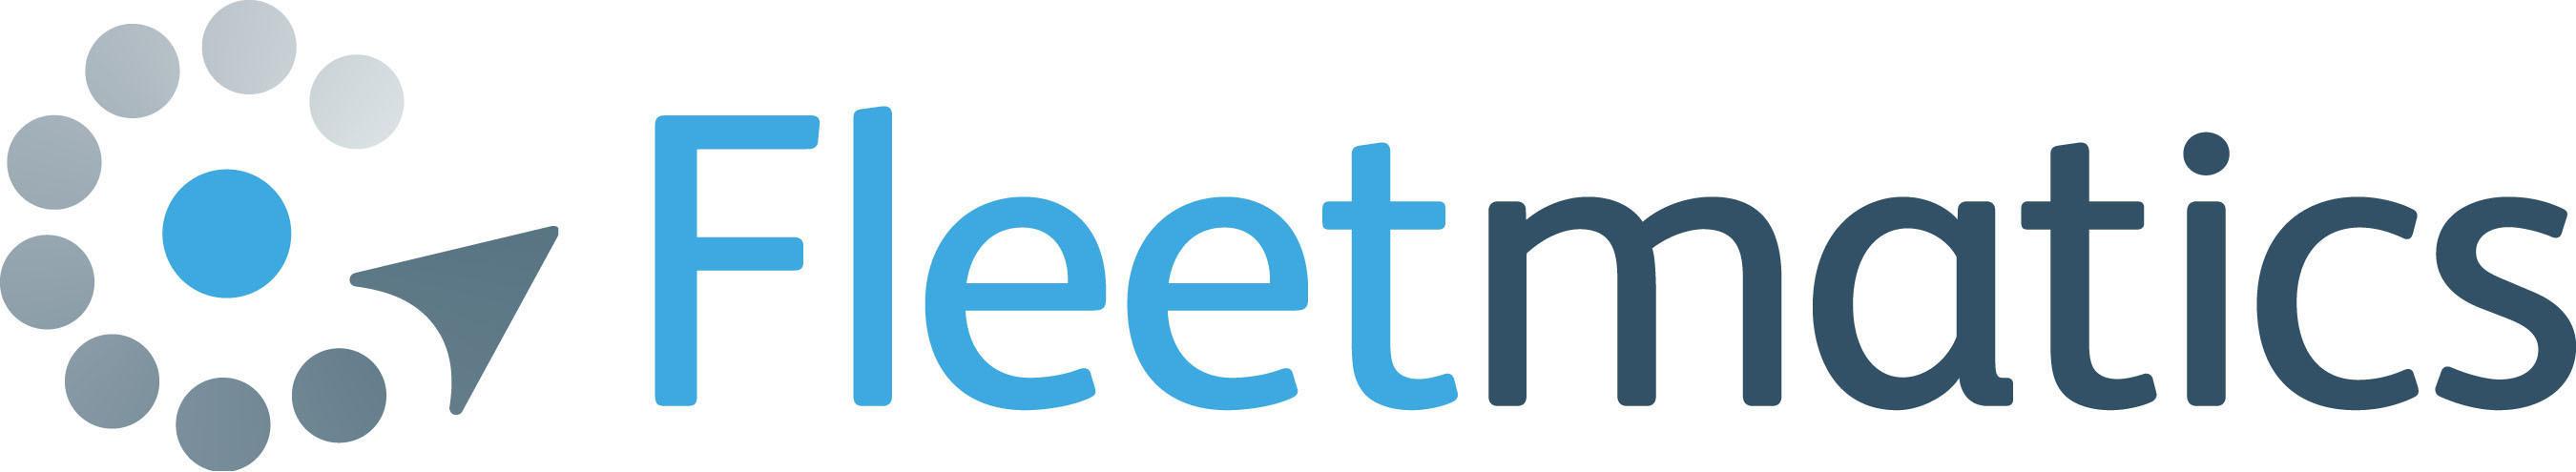 Fleetmatics Logo.